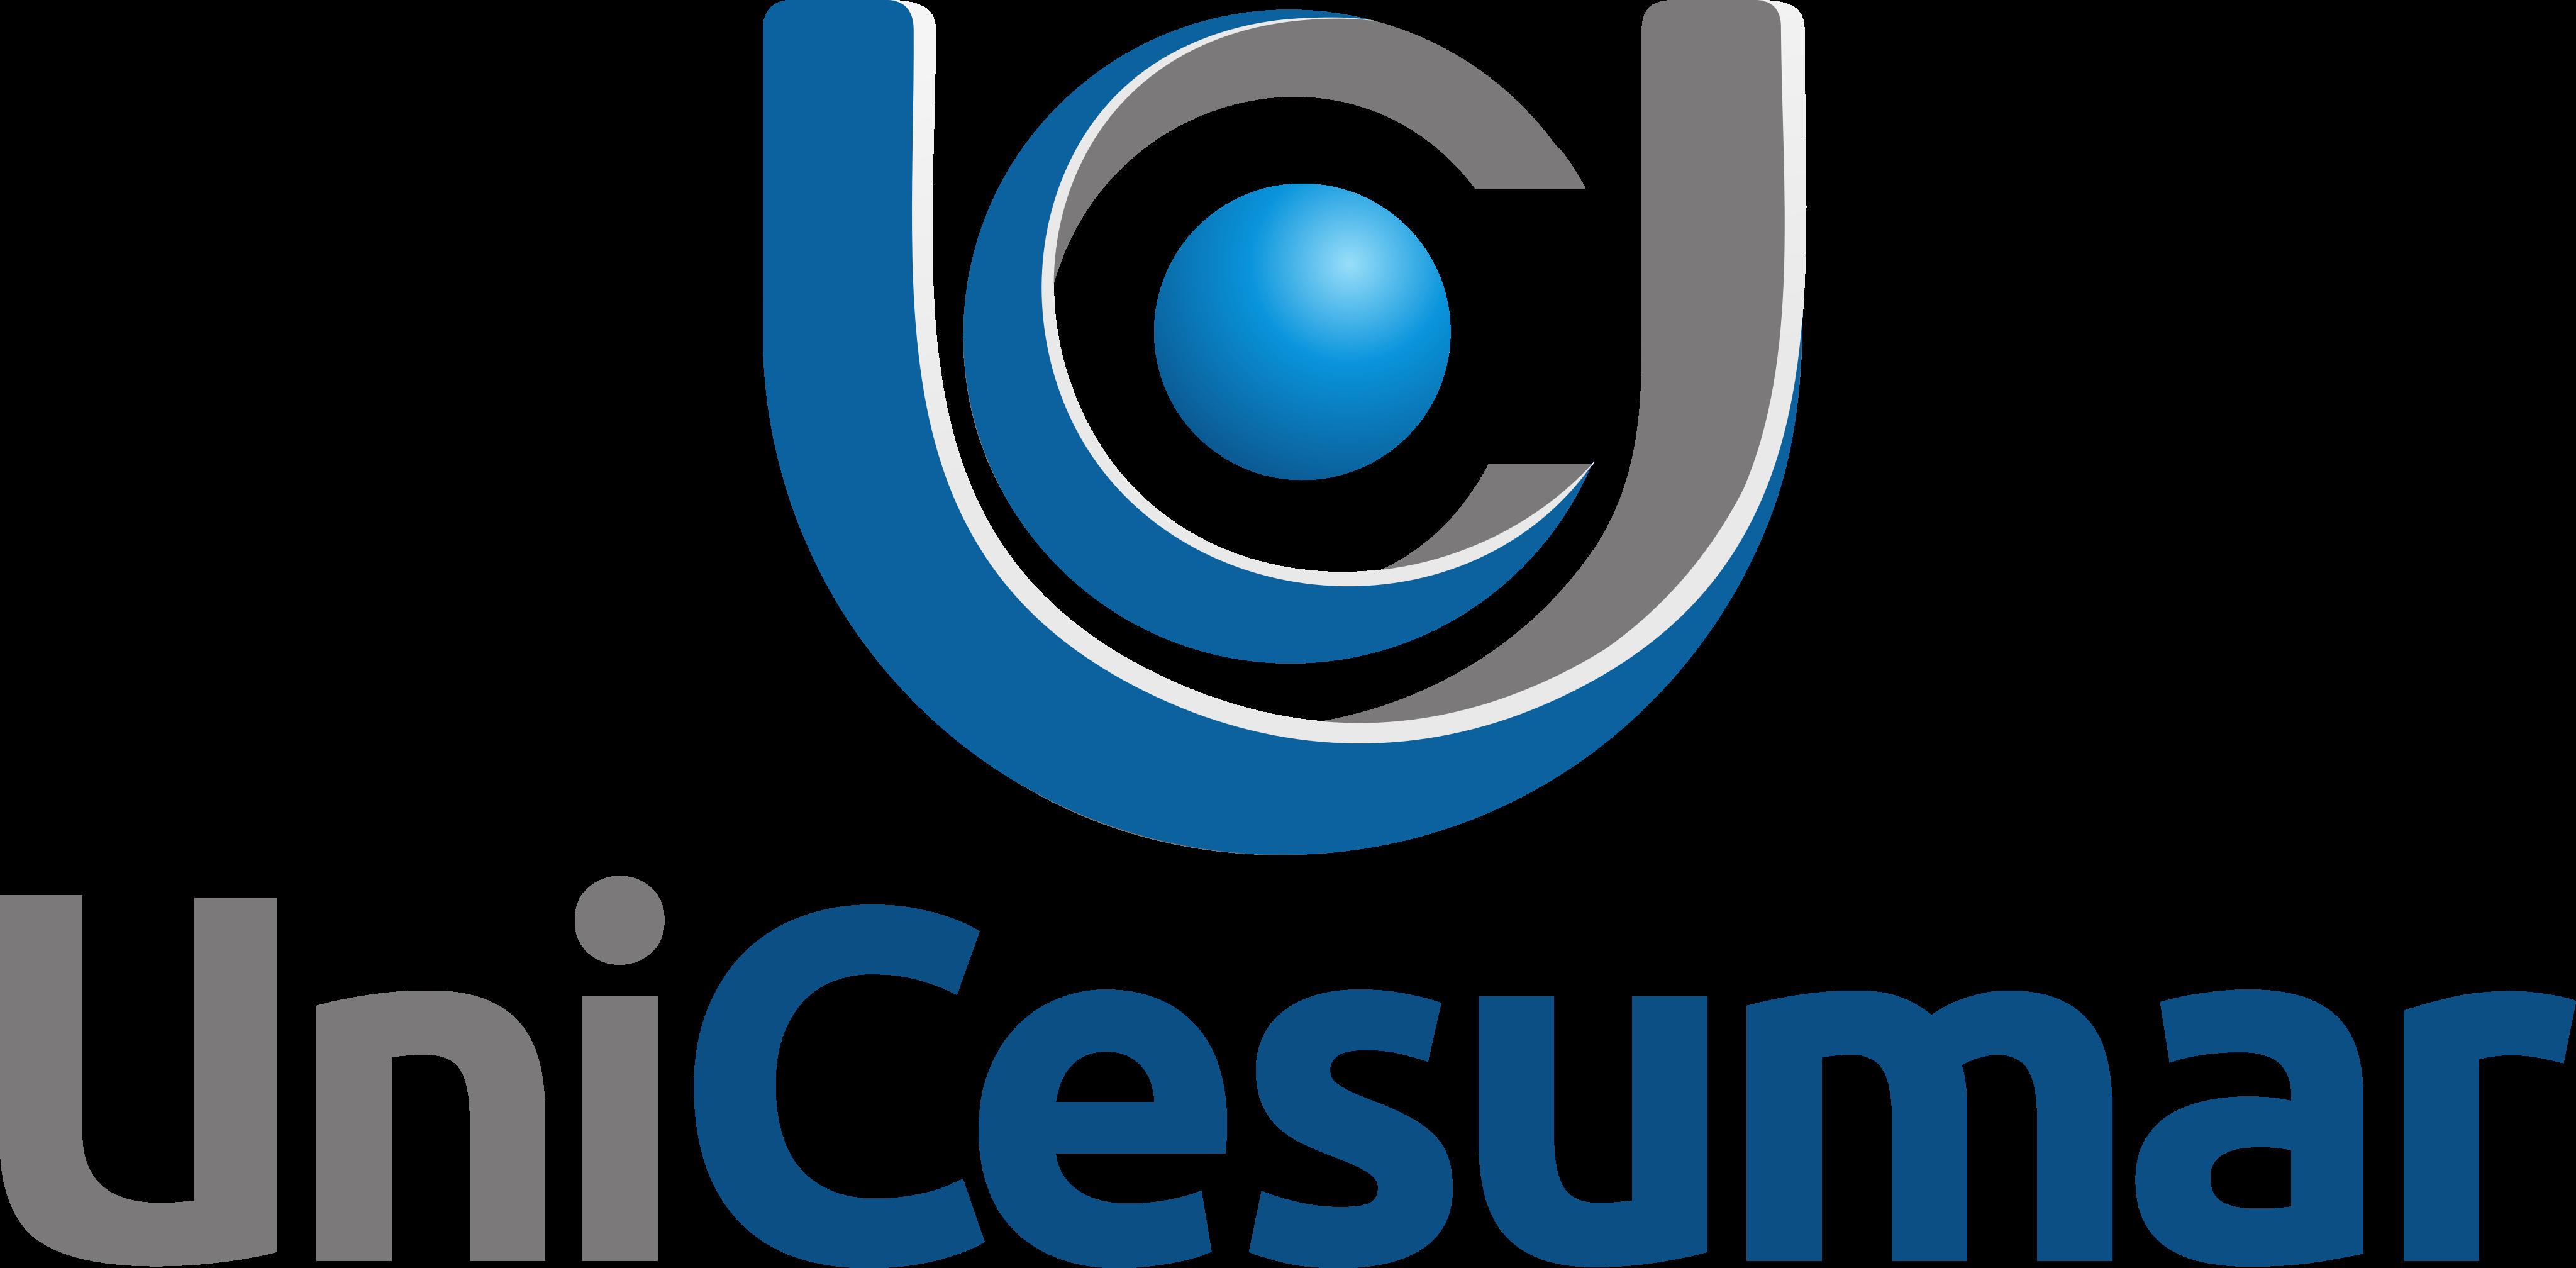 unicesumar logo 1 - Unicesumar Logo